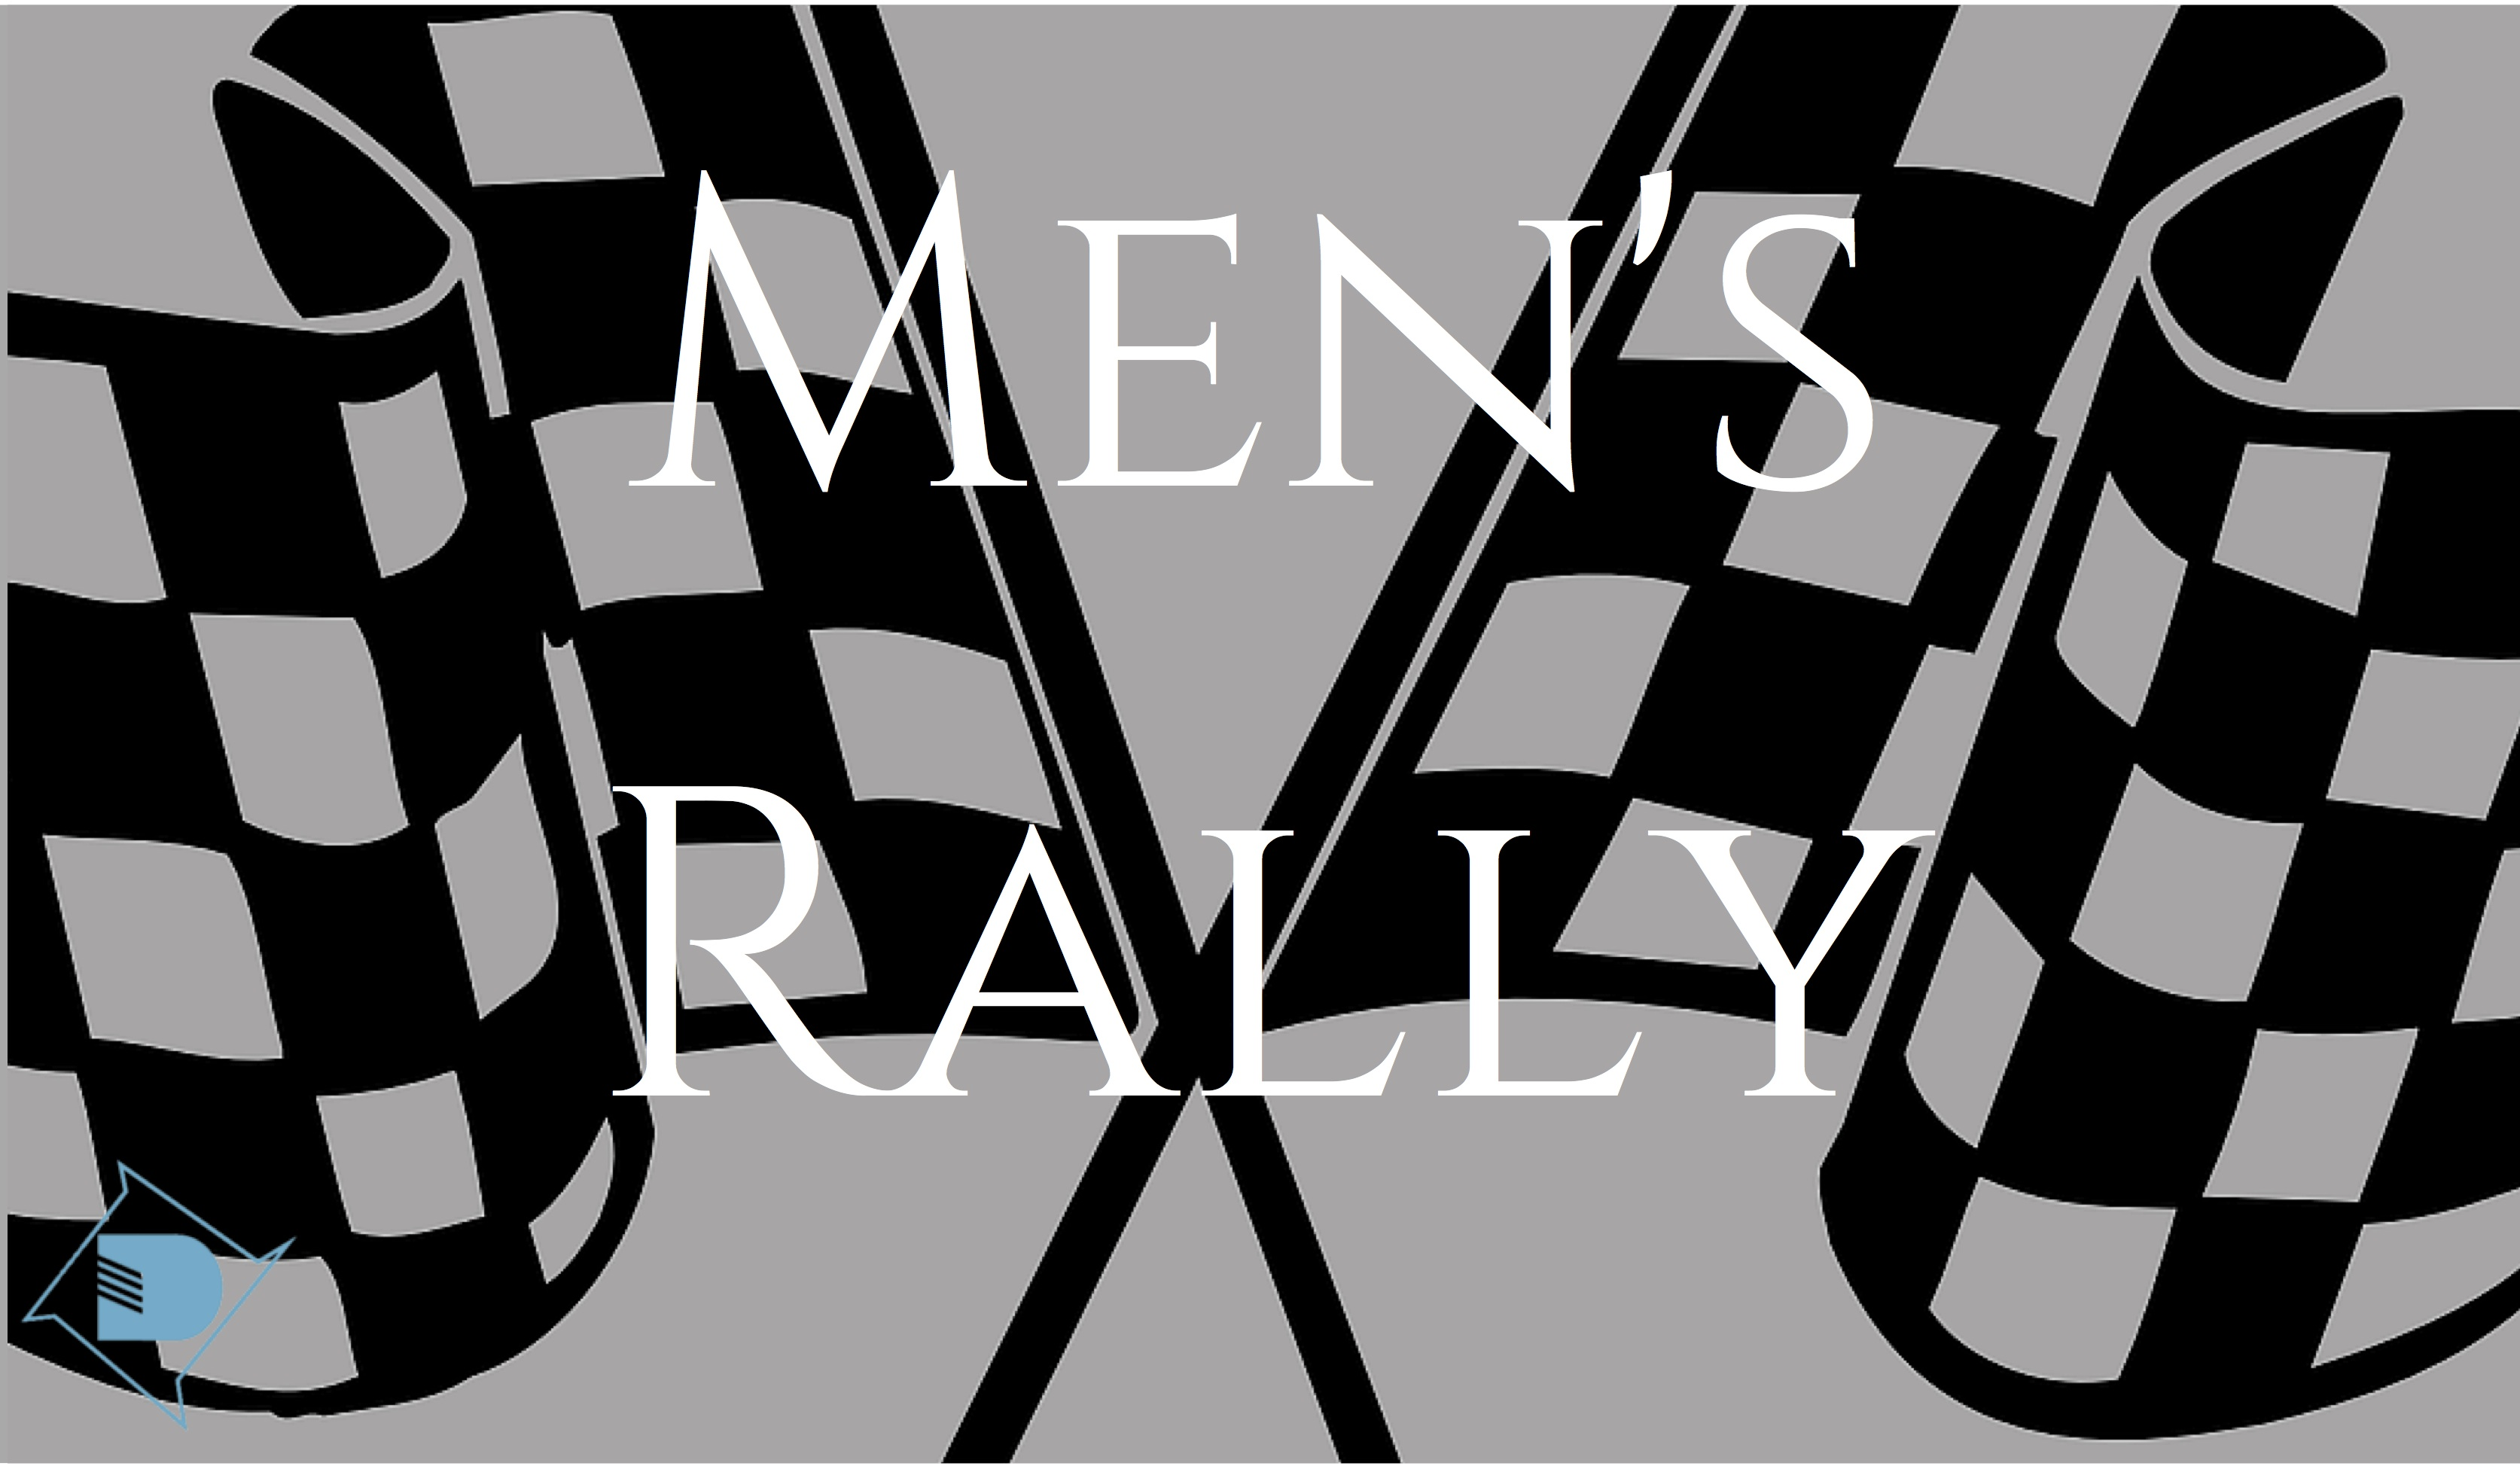 Men's Rally image